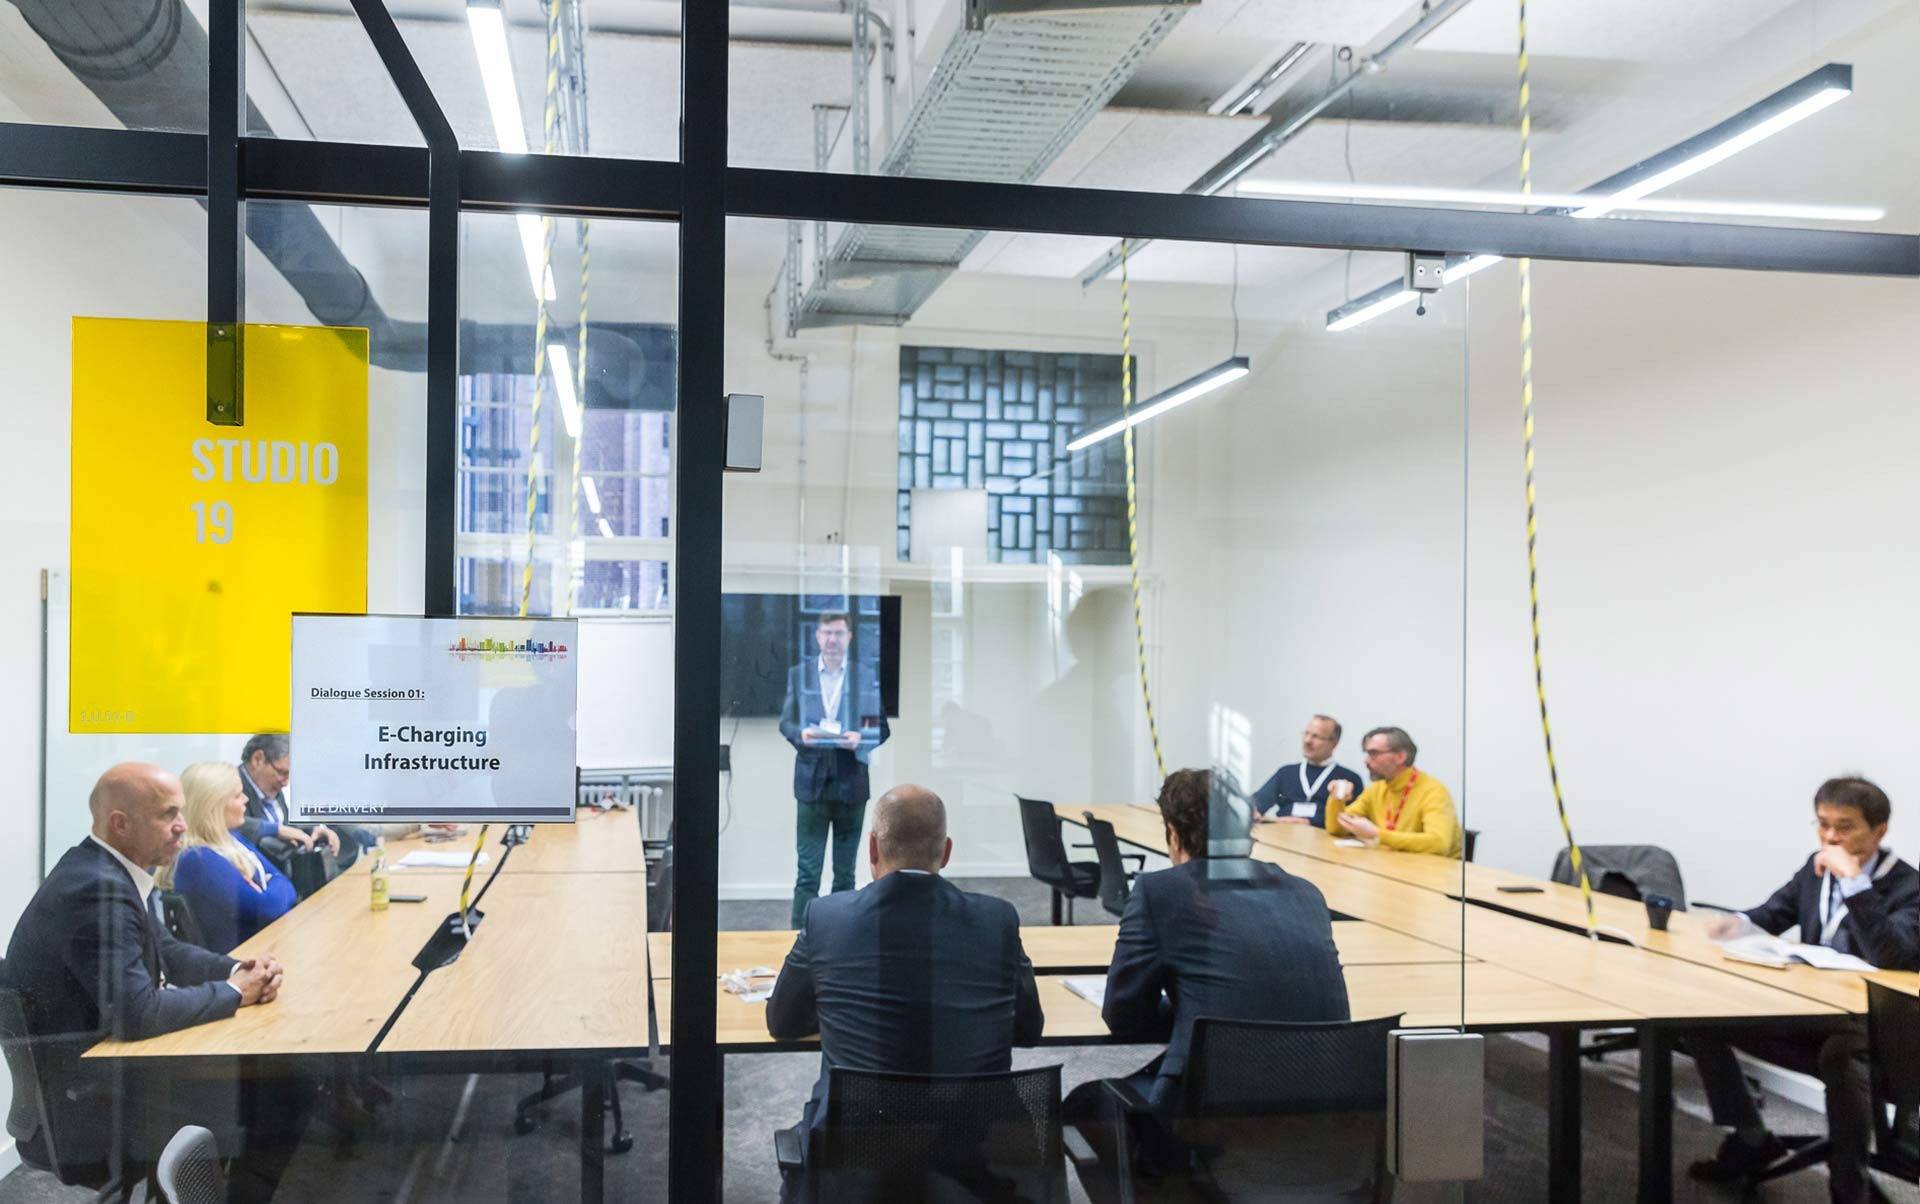 eventfotos-mobilitaet-veranstaltung-berlin-tagung-kongress-dialogue-sessions